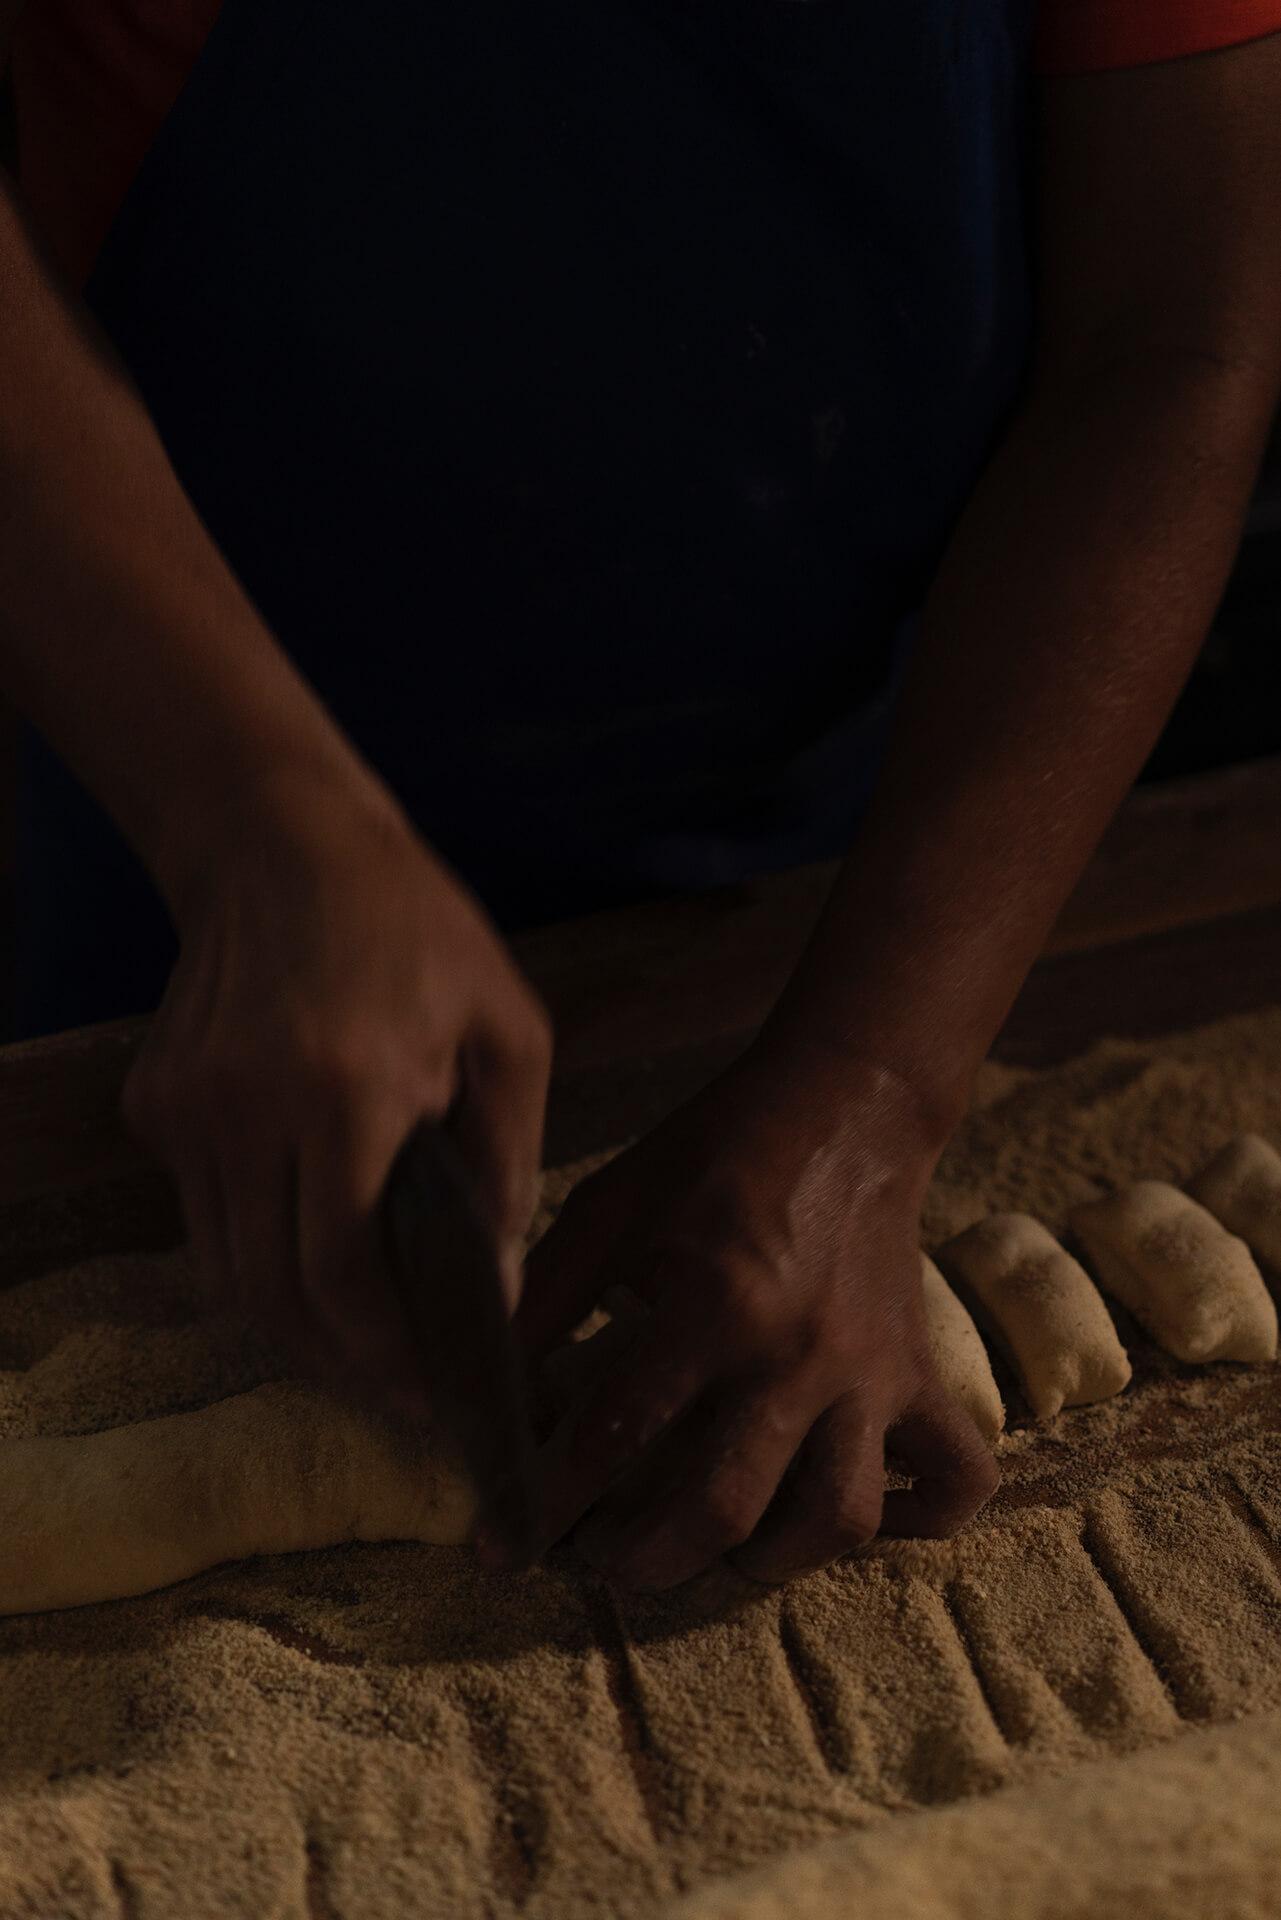 A bakery worker cuts the dough into pan de sal